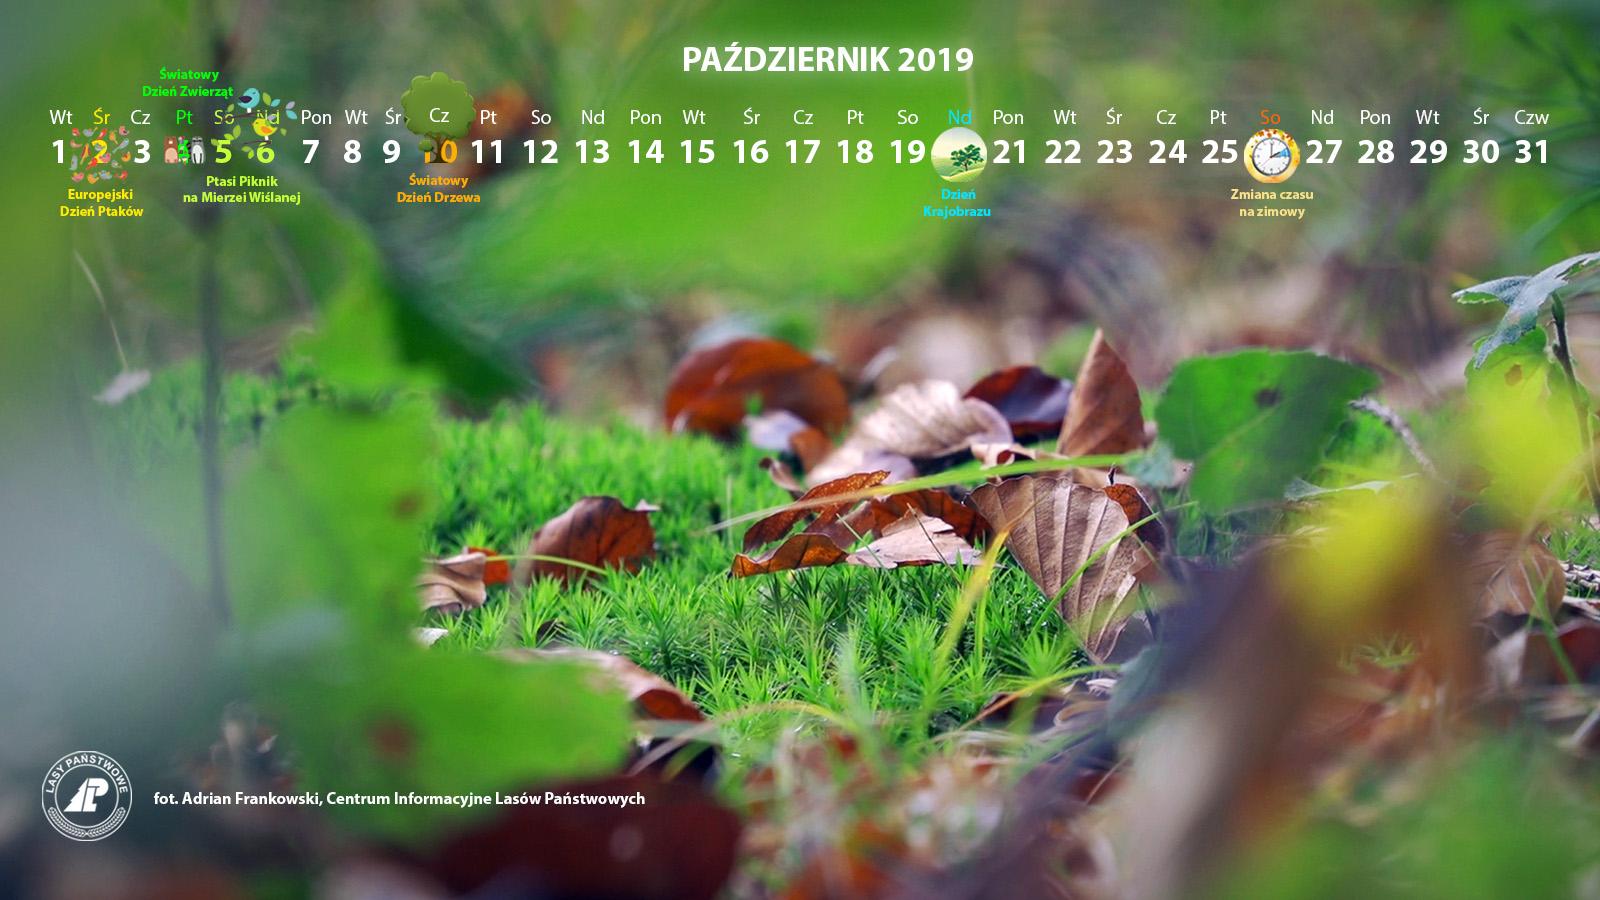 Kalendarz_październik_2019_1600x900[1].jpg